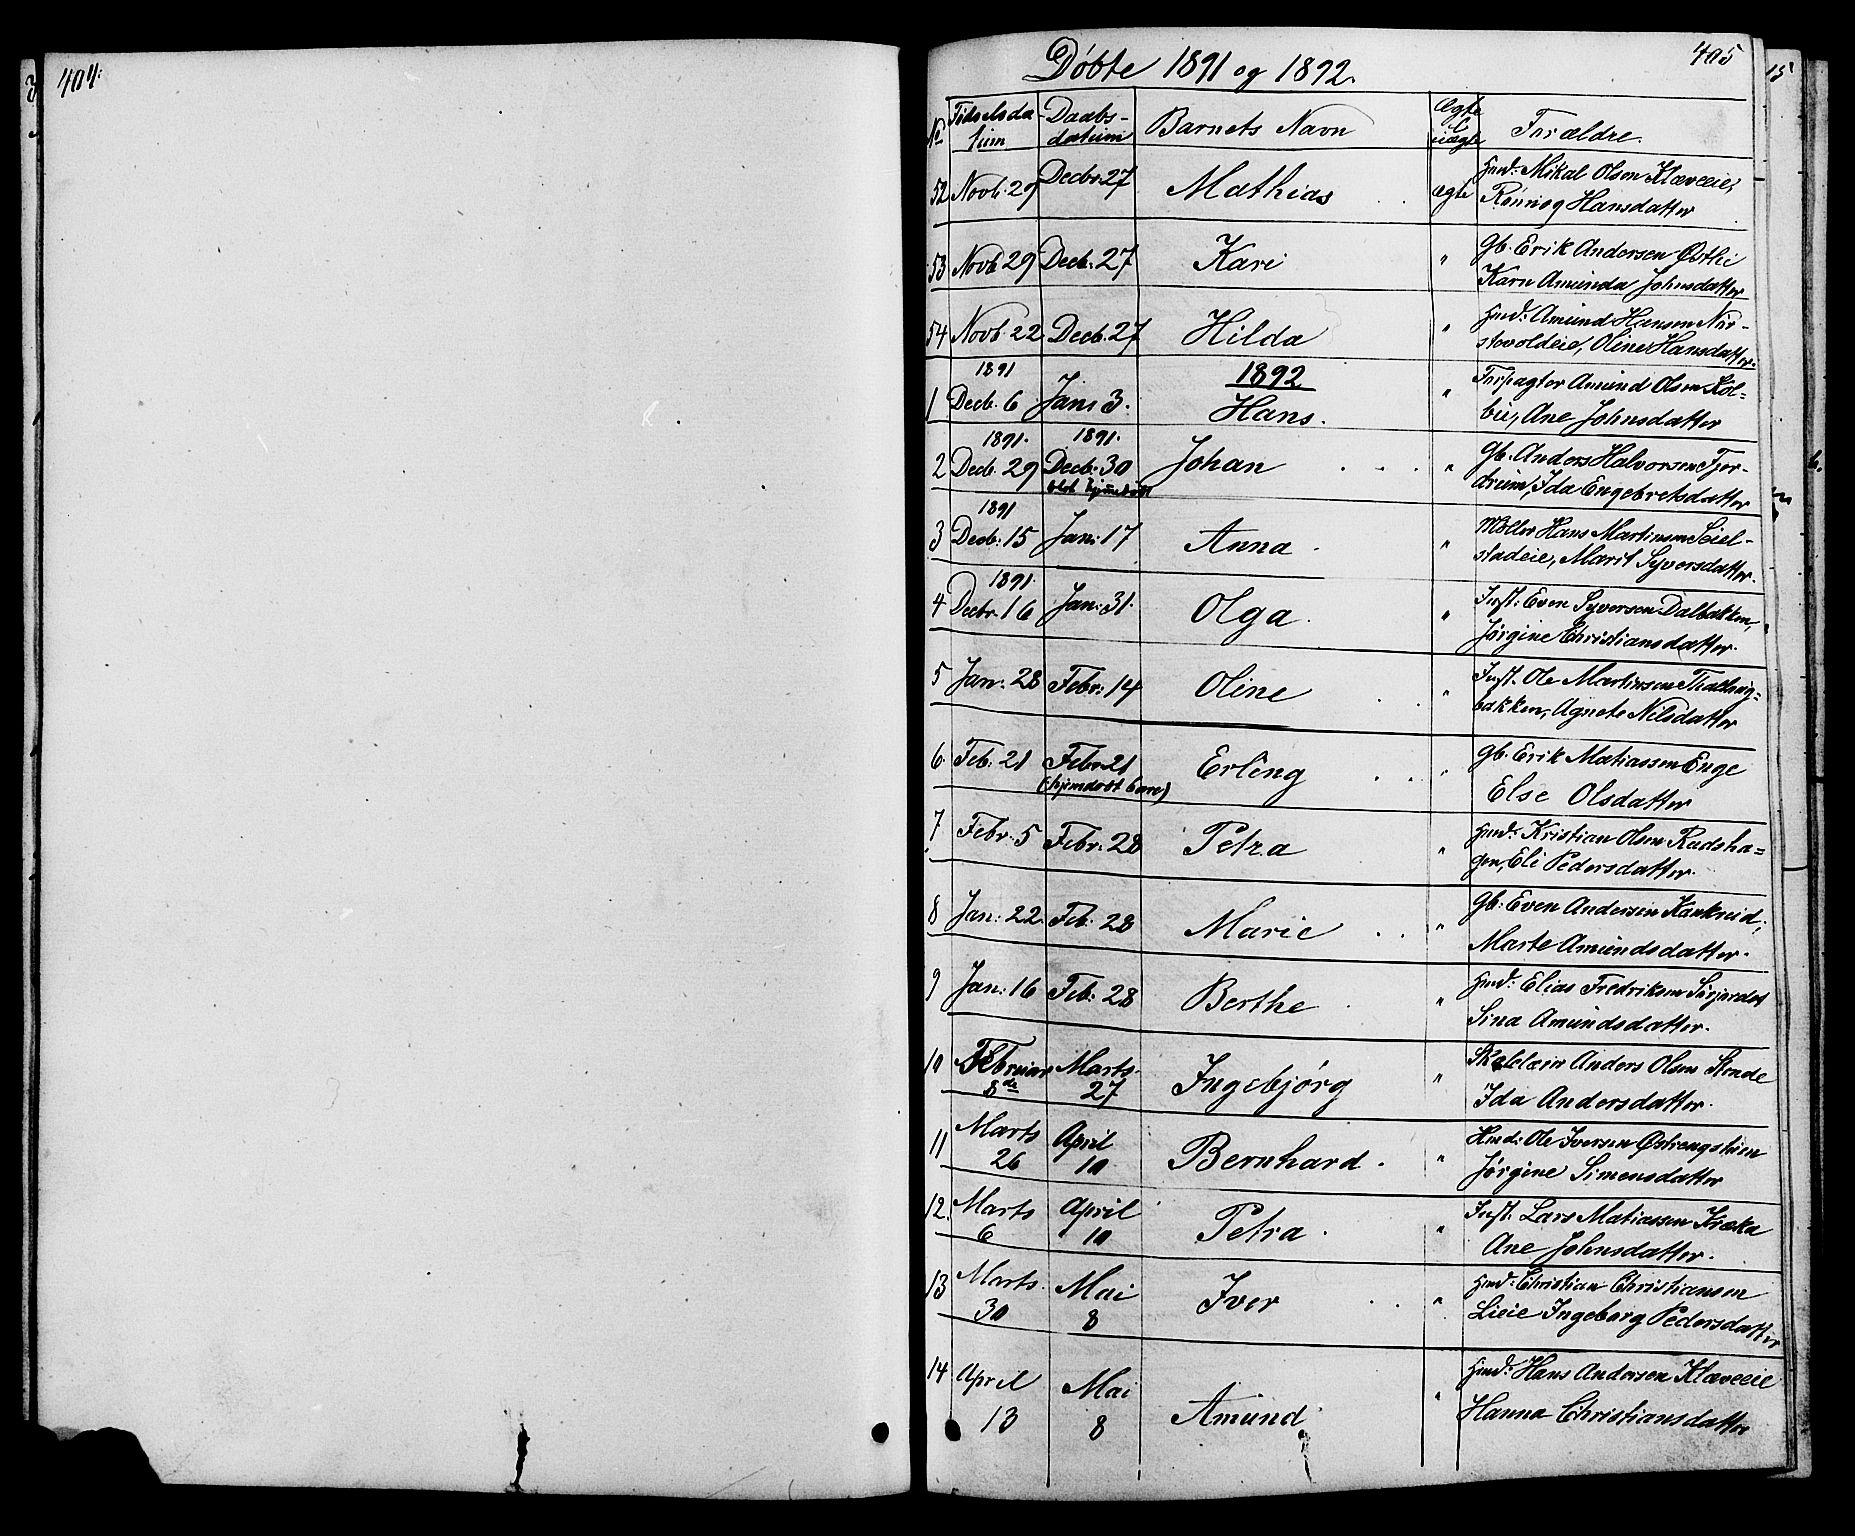 SAH, Østre Gausdal prestekontor, Klokkerbok nr. 1, 1863-1893, s. 404-405